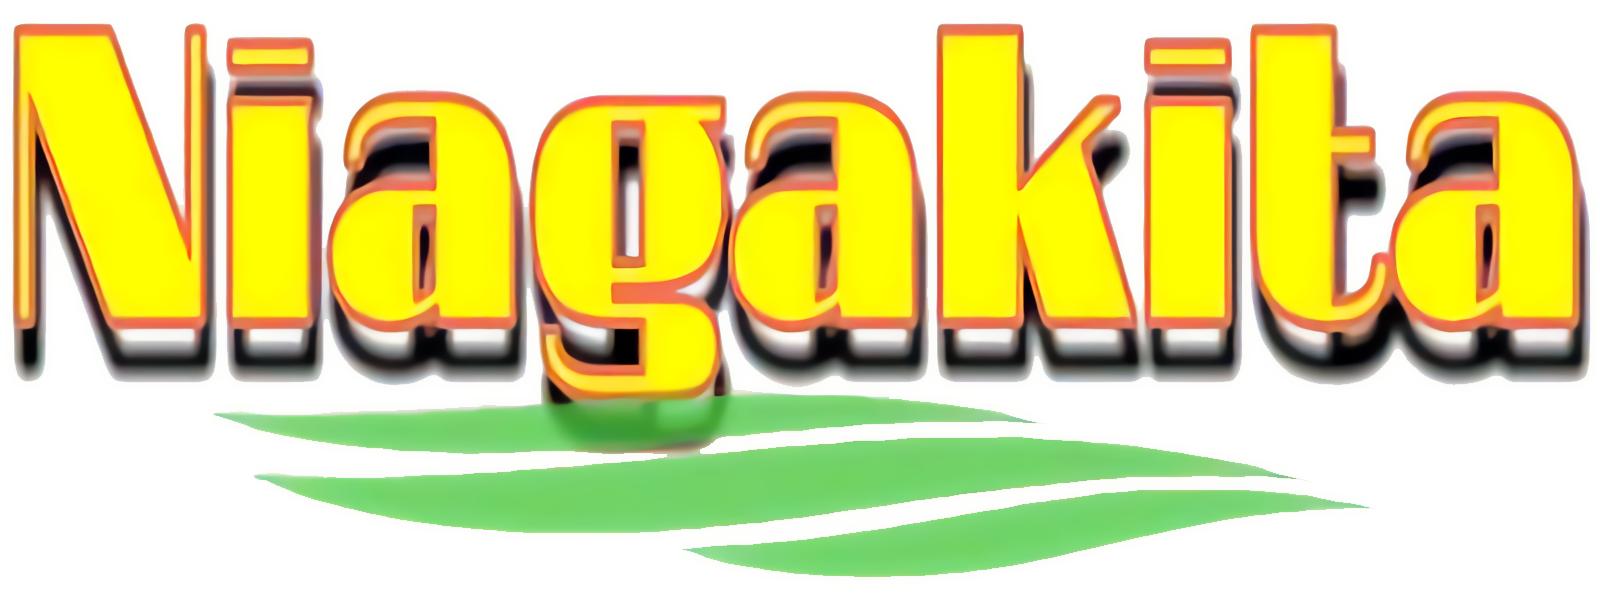 Niagakita